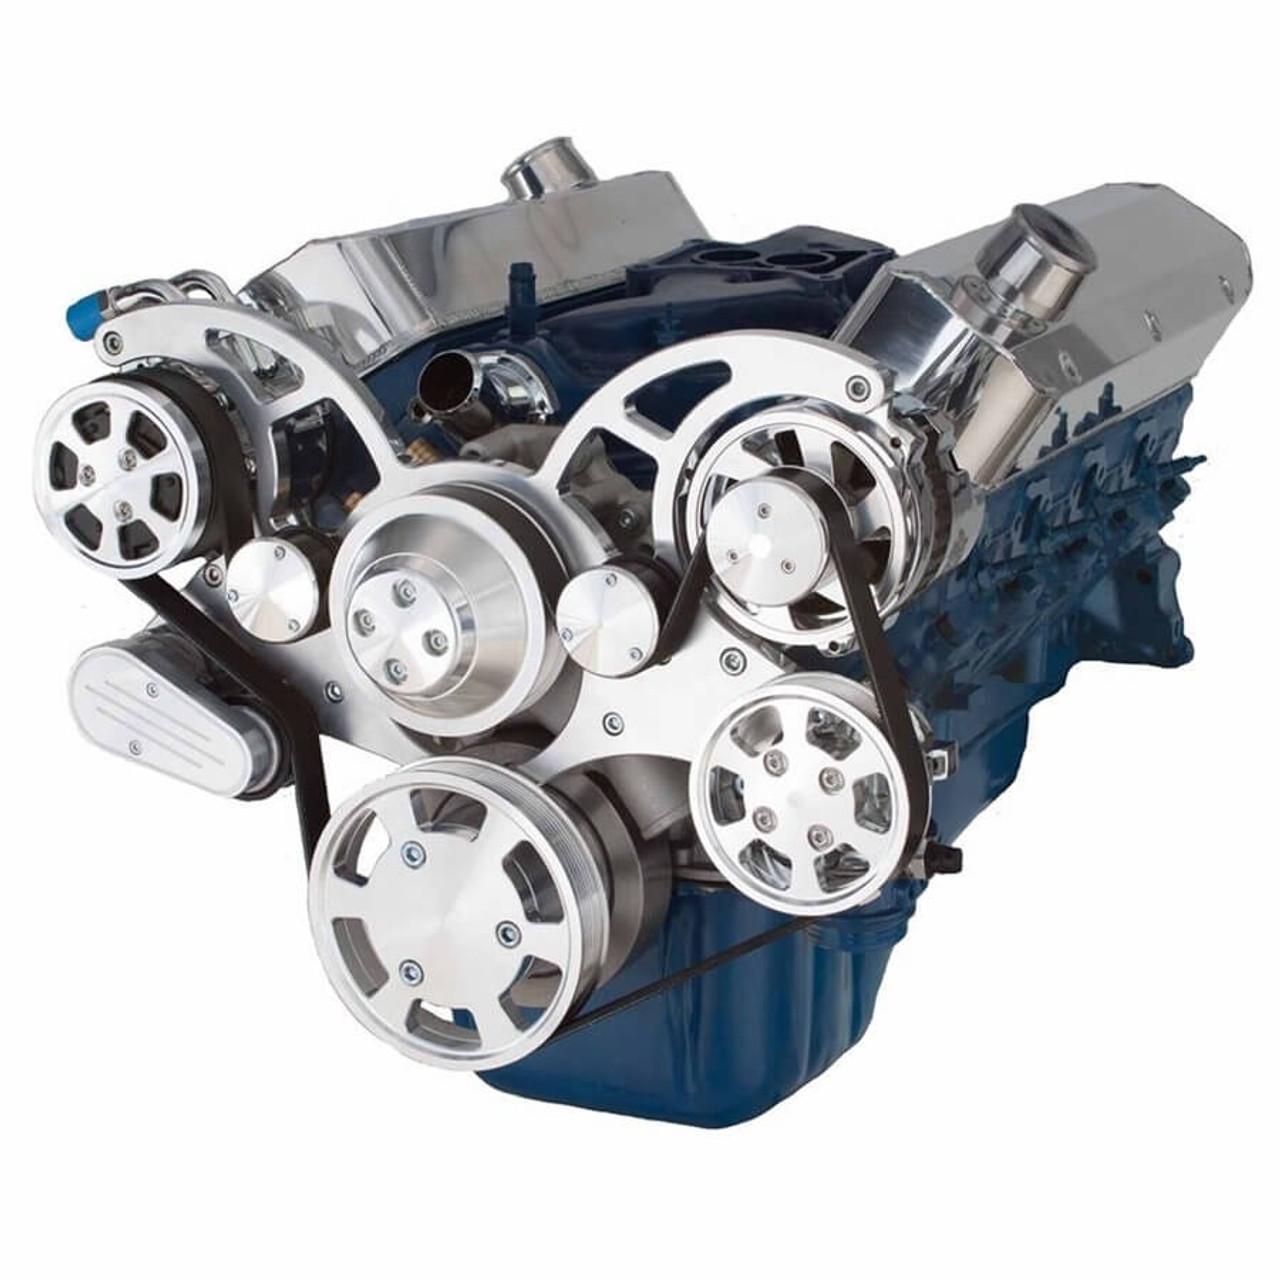 medium resolution of 1977 351 cleveland engine diagram